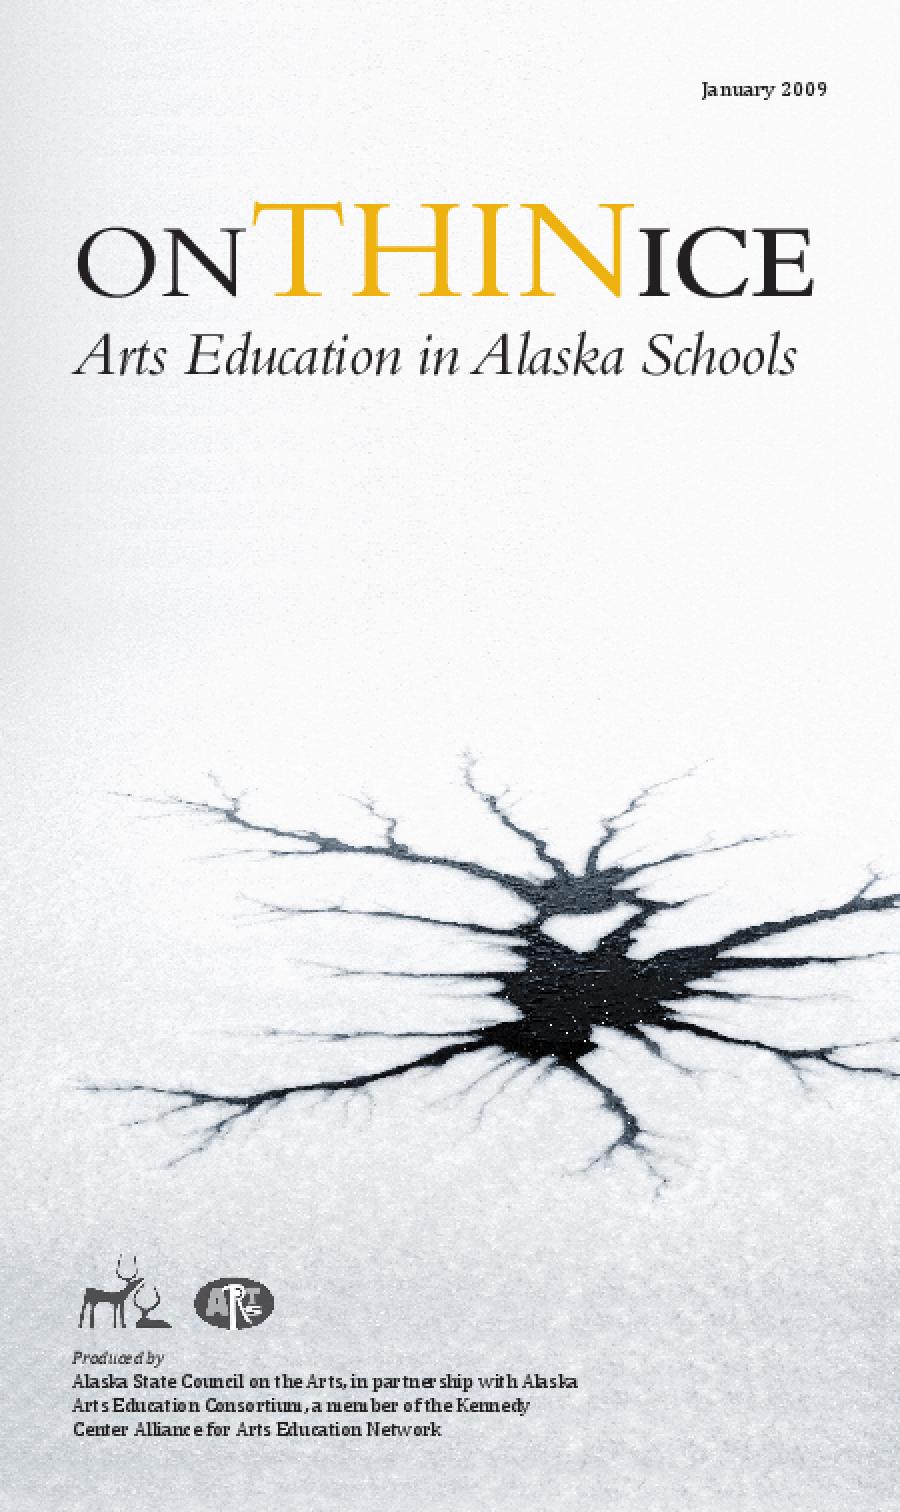 On Thin Ice: Arts Education in Alaska Schools